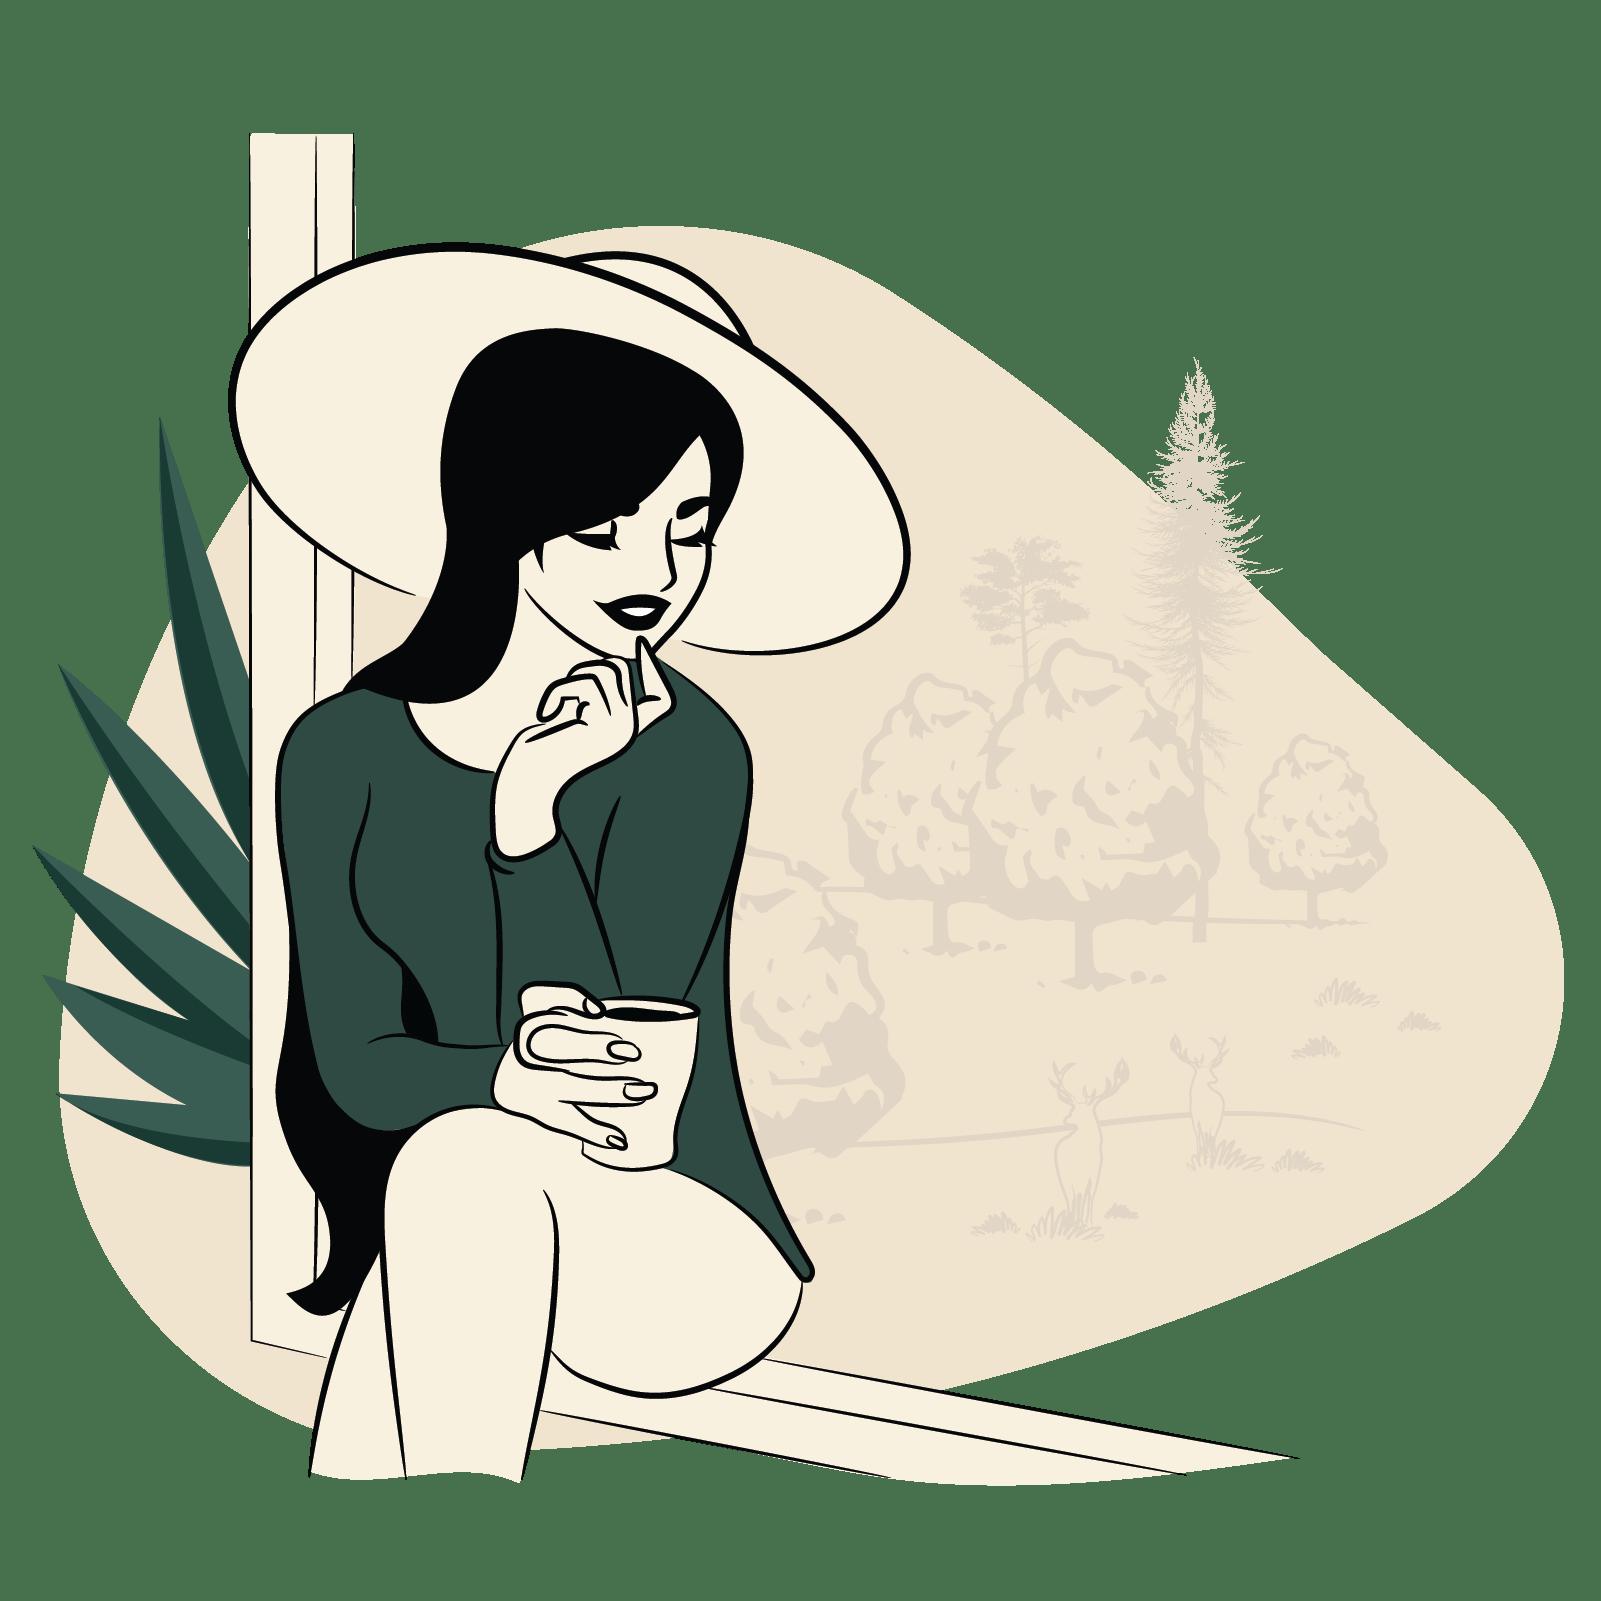 Arabica koffiebonen van premium kwaliteit